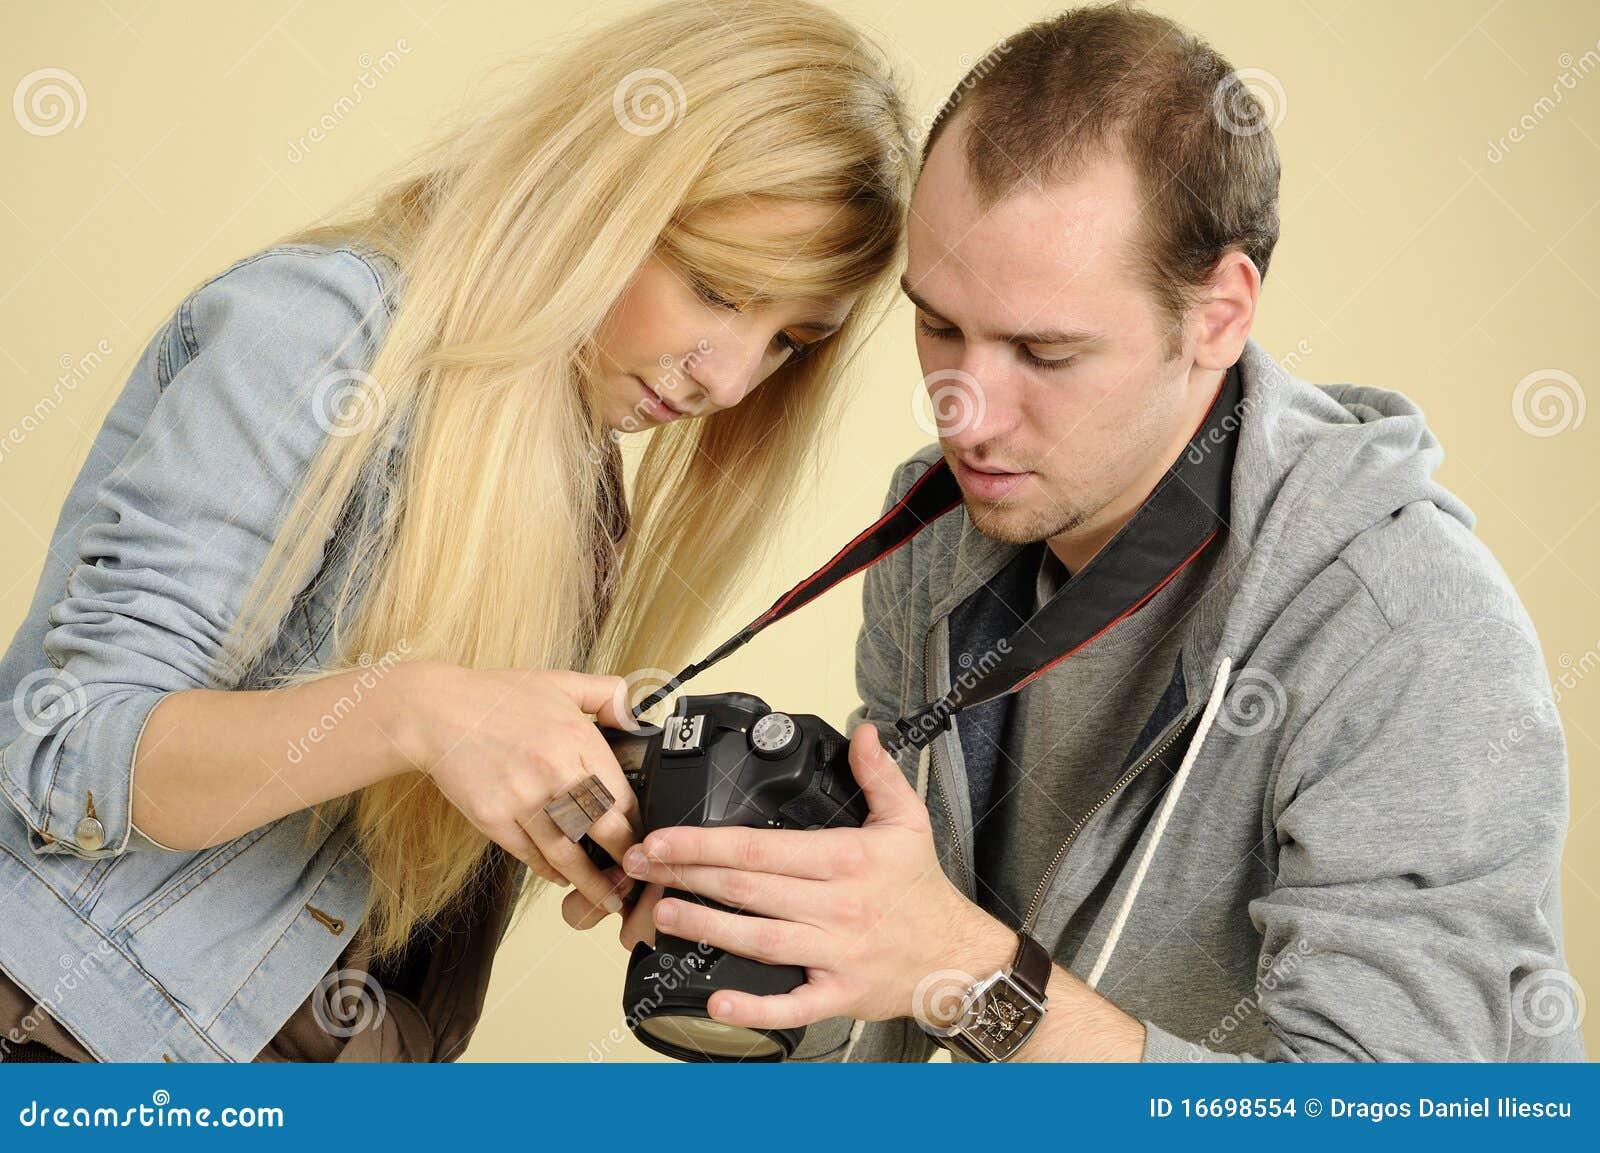 photographer studying on camera stock images image 16698554